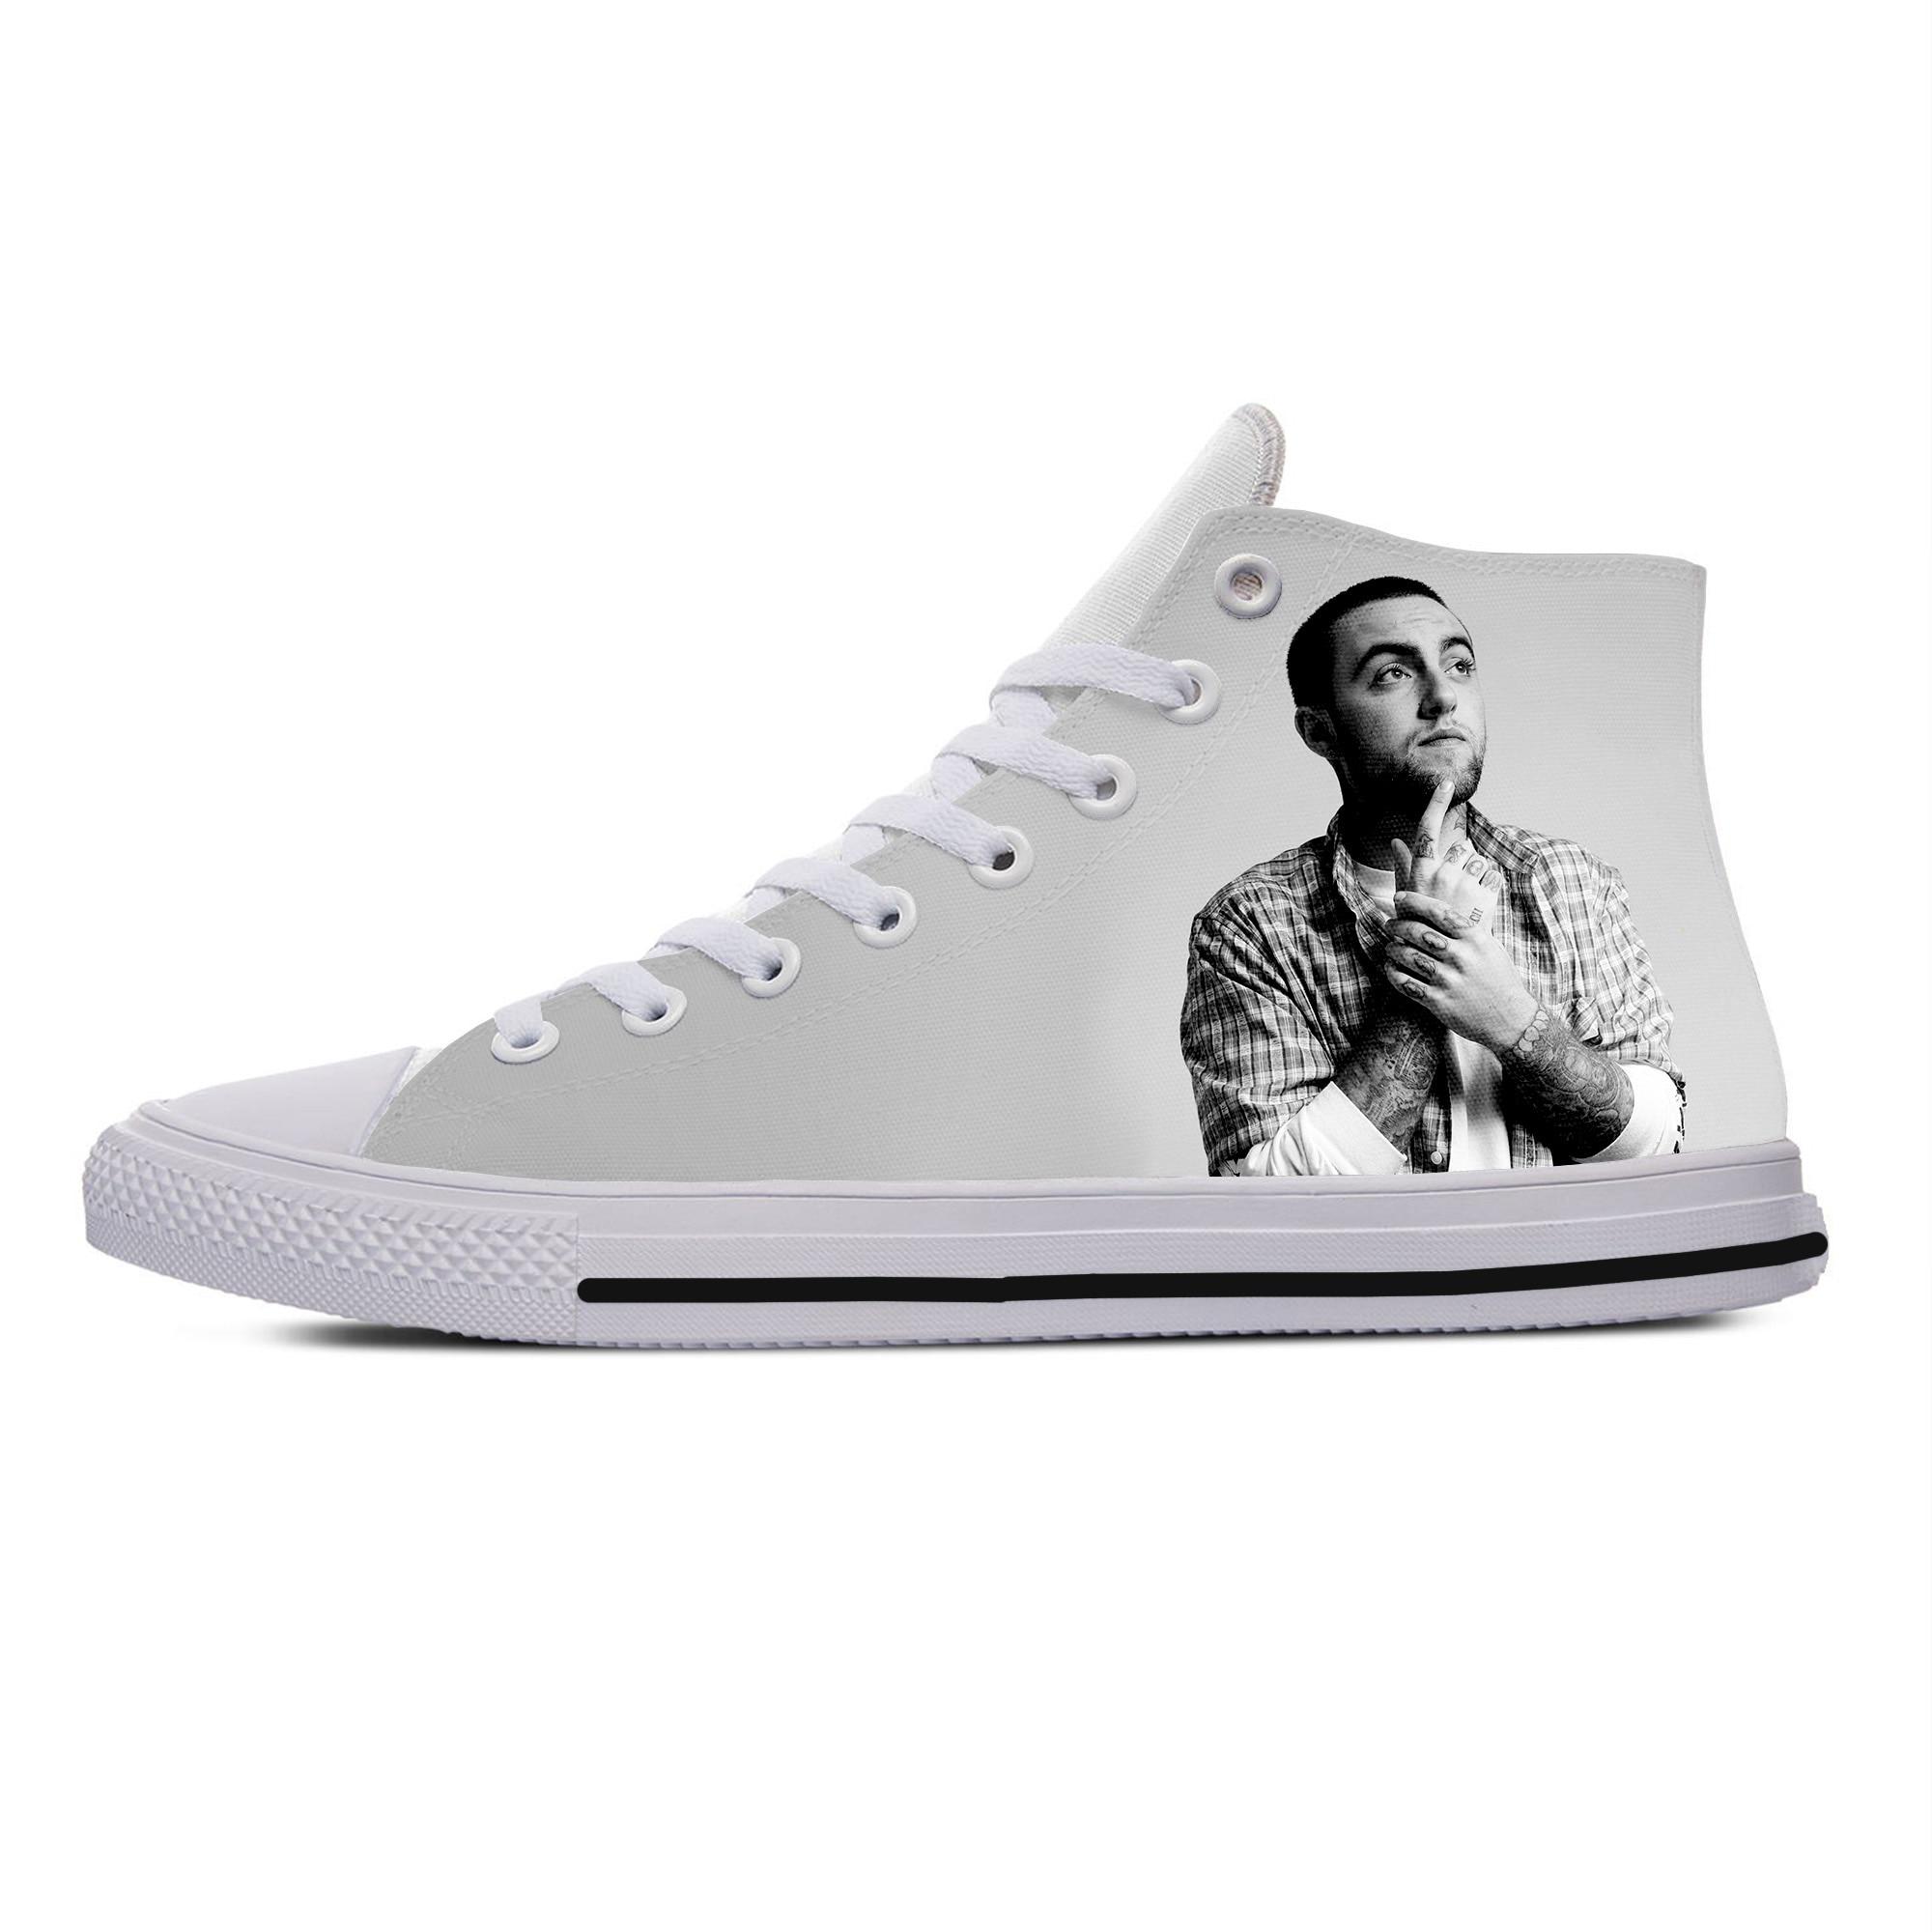 Mac Miller High Sneakers for men/women 1